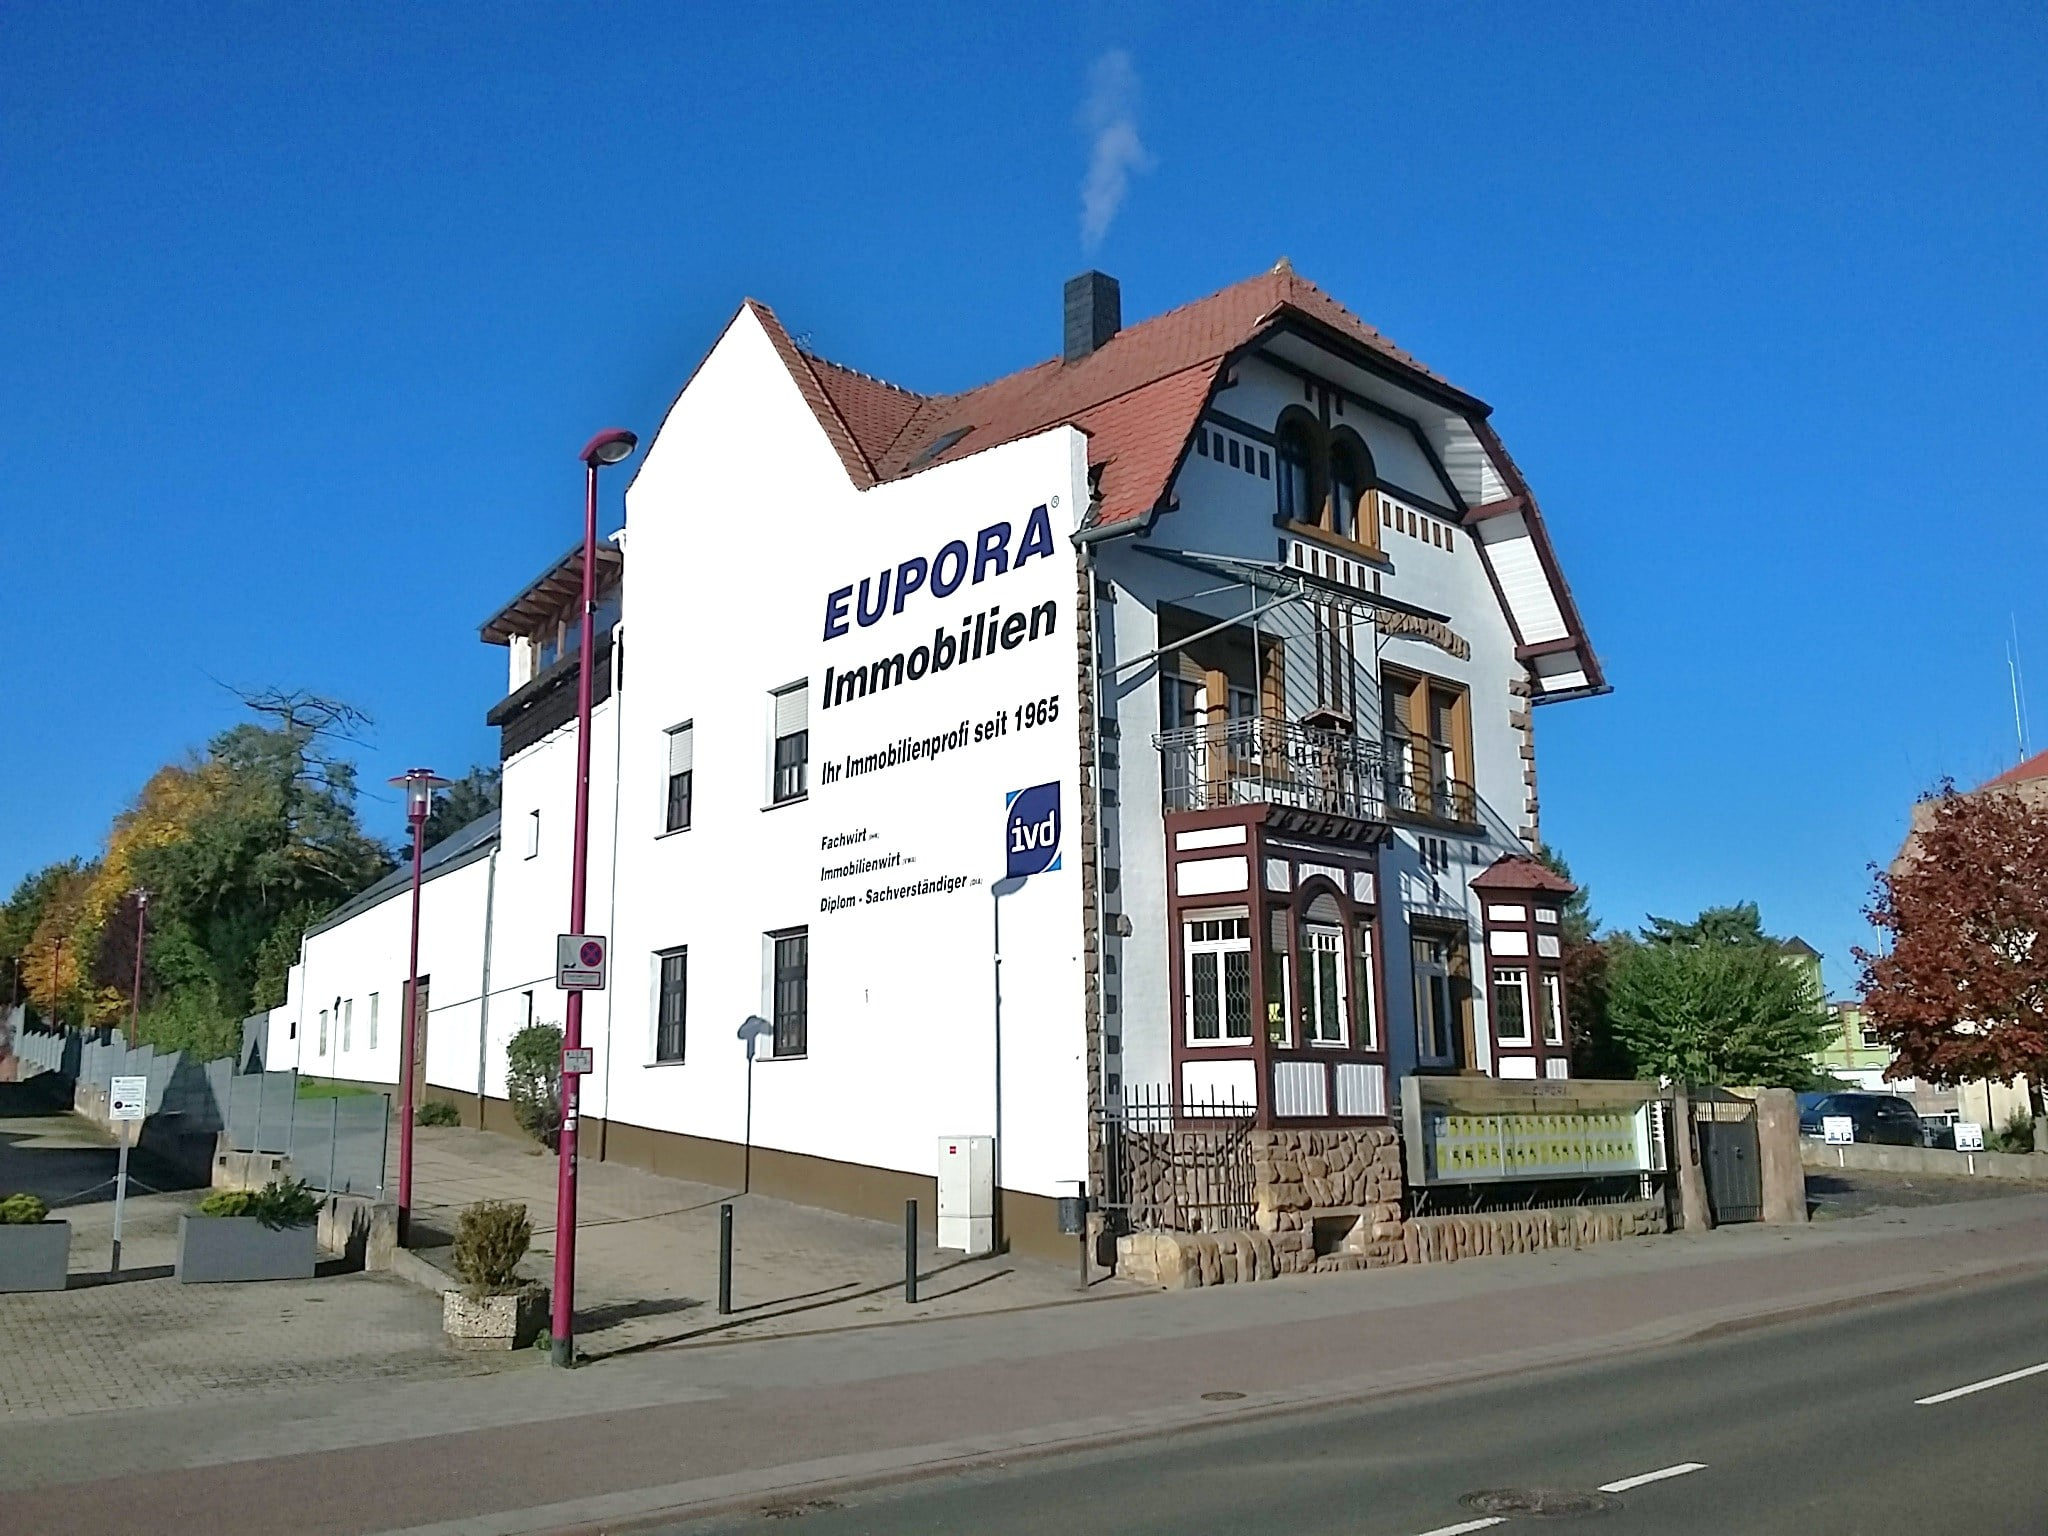 EUPORA-Immobilien